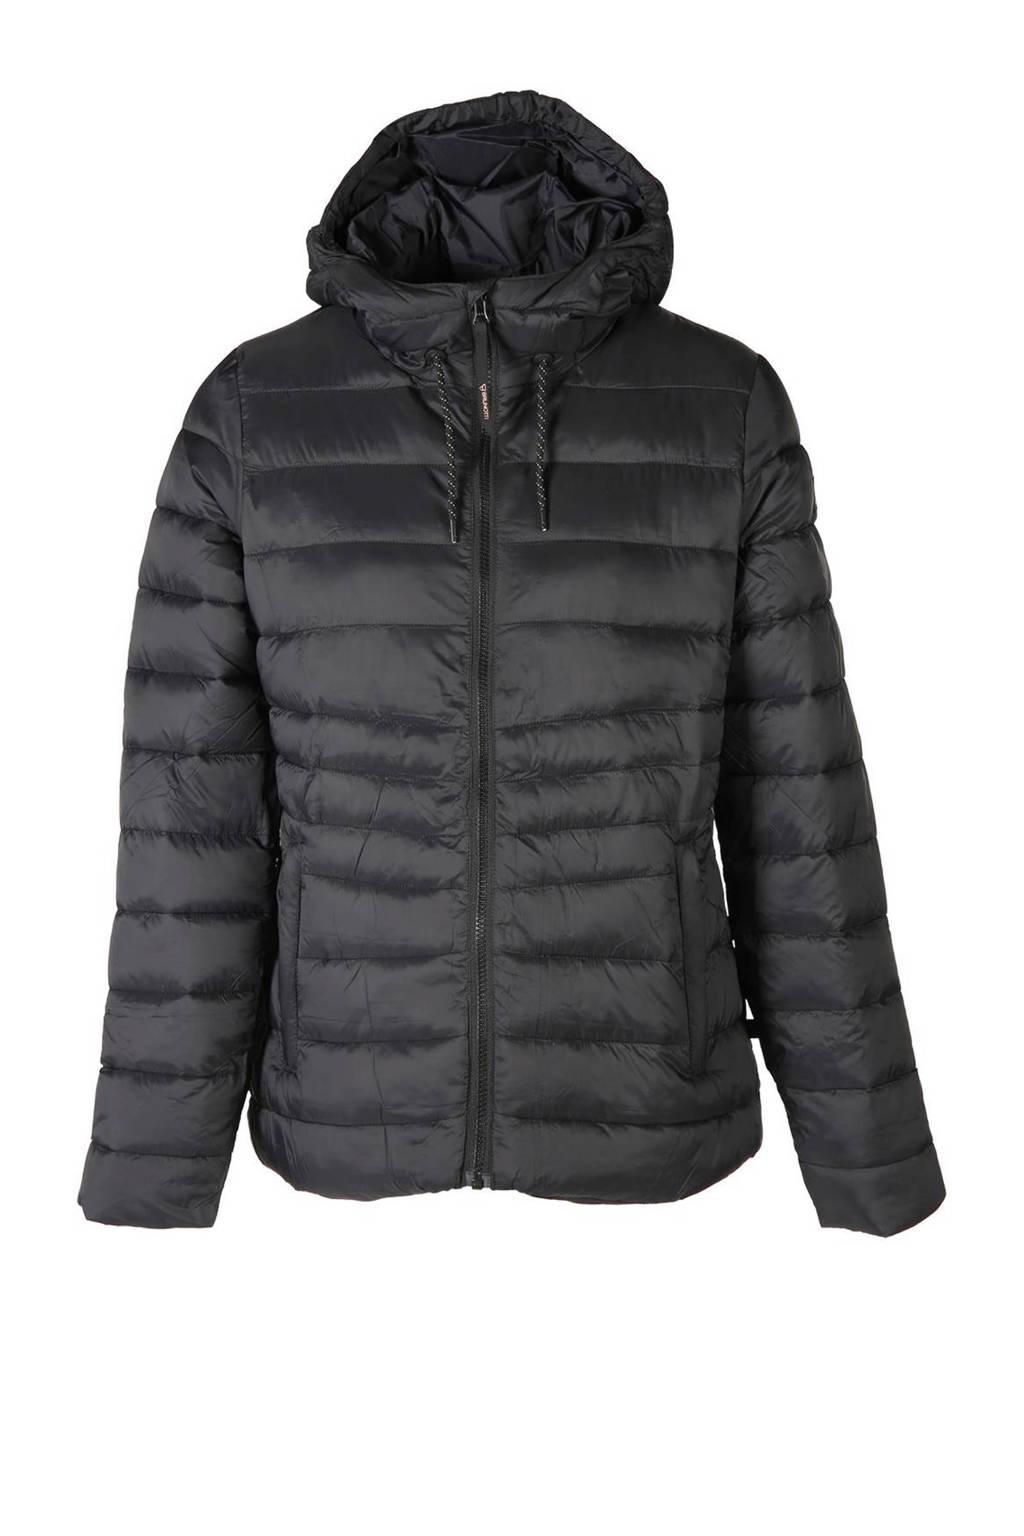 Brunotti gewatteerde jas Maija zwart, Zwart